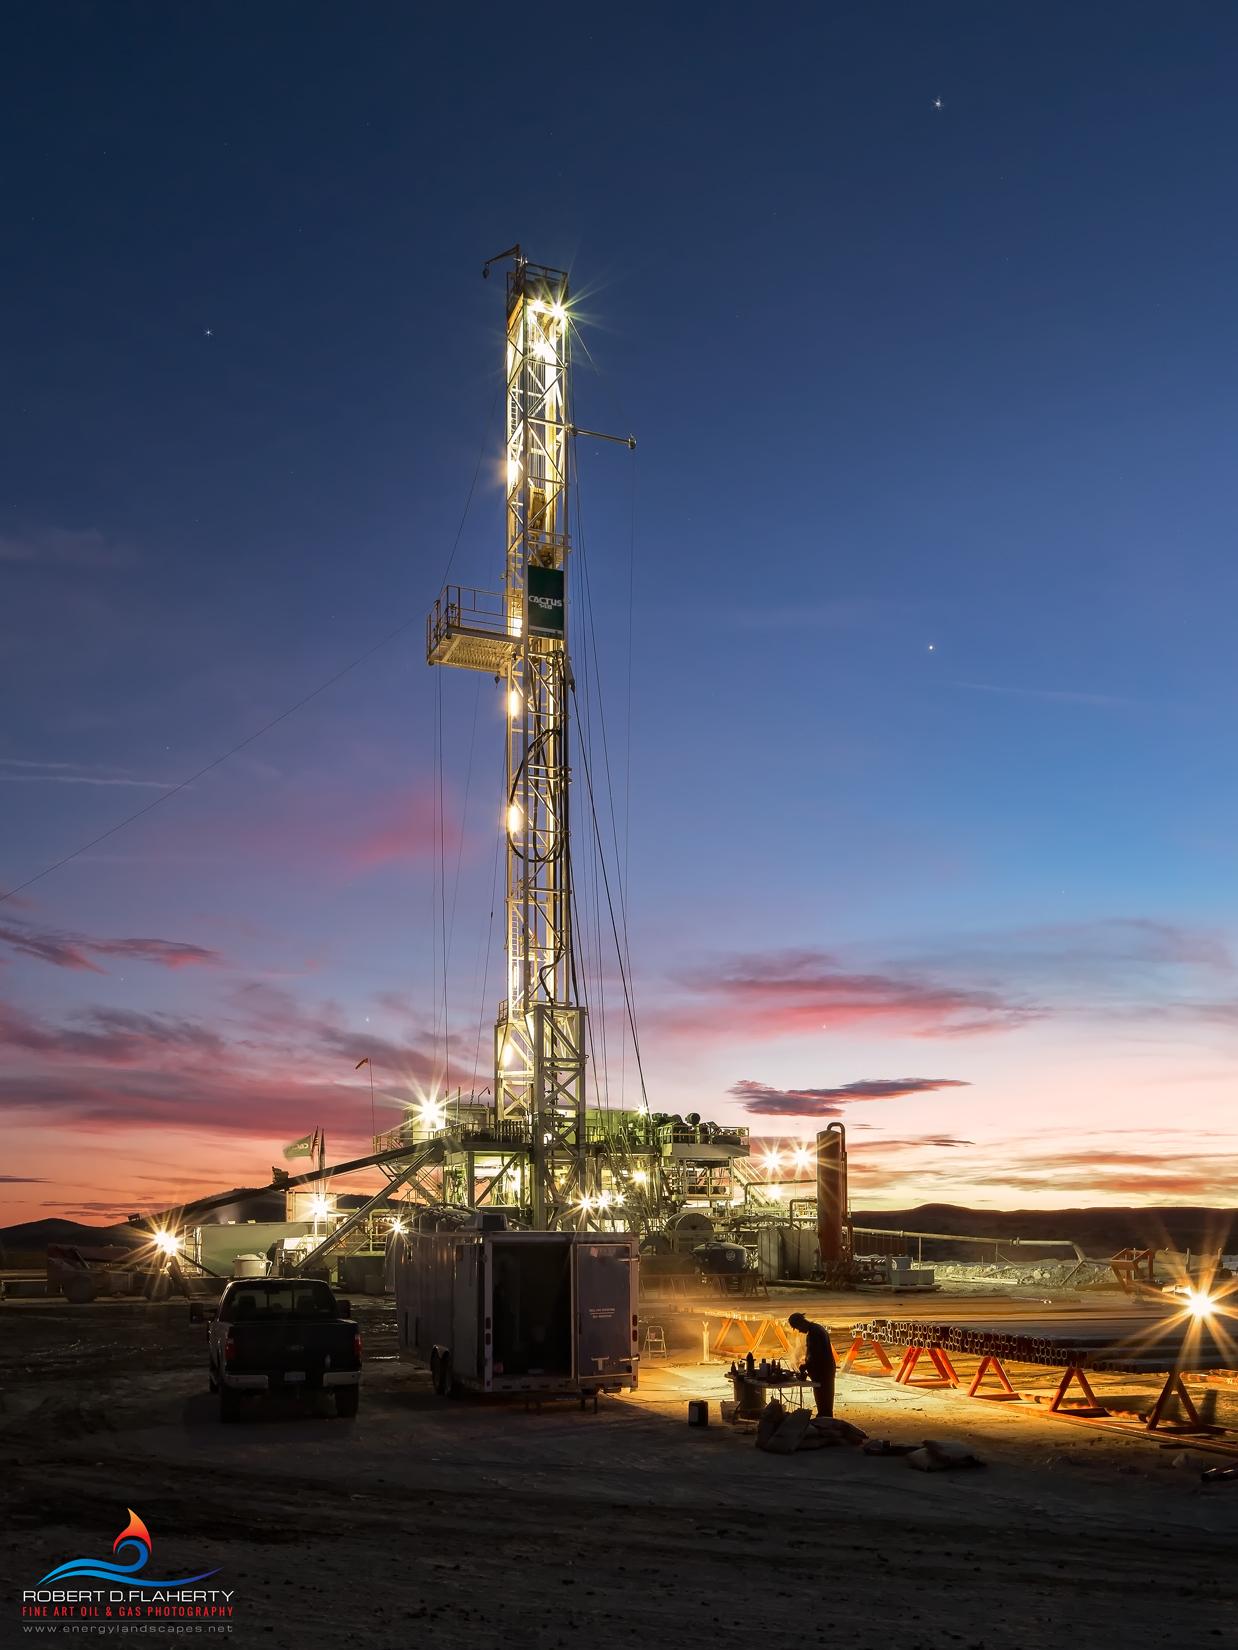 Delaware Basi, Permian Basin, Texas, Western Texas, drilling rig, casing, Cimarex, sunrise, Winter, cold, January, Orla Texas, Cactus 148, Cactus Drilling, photo